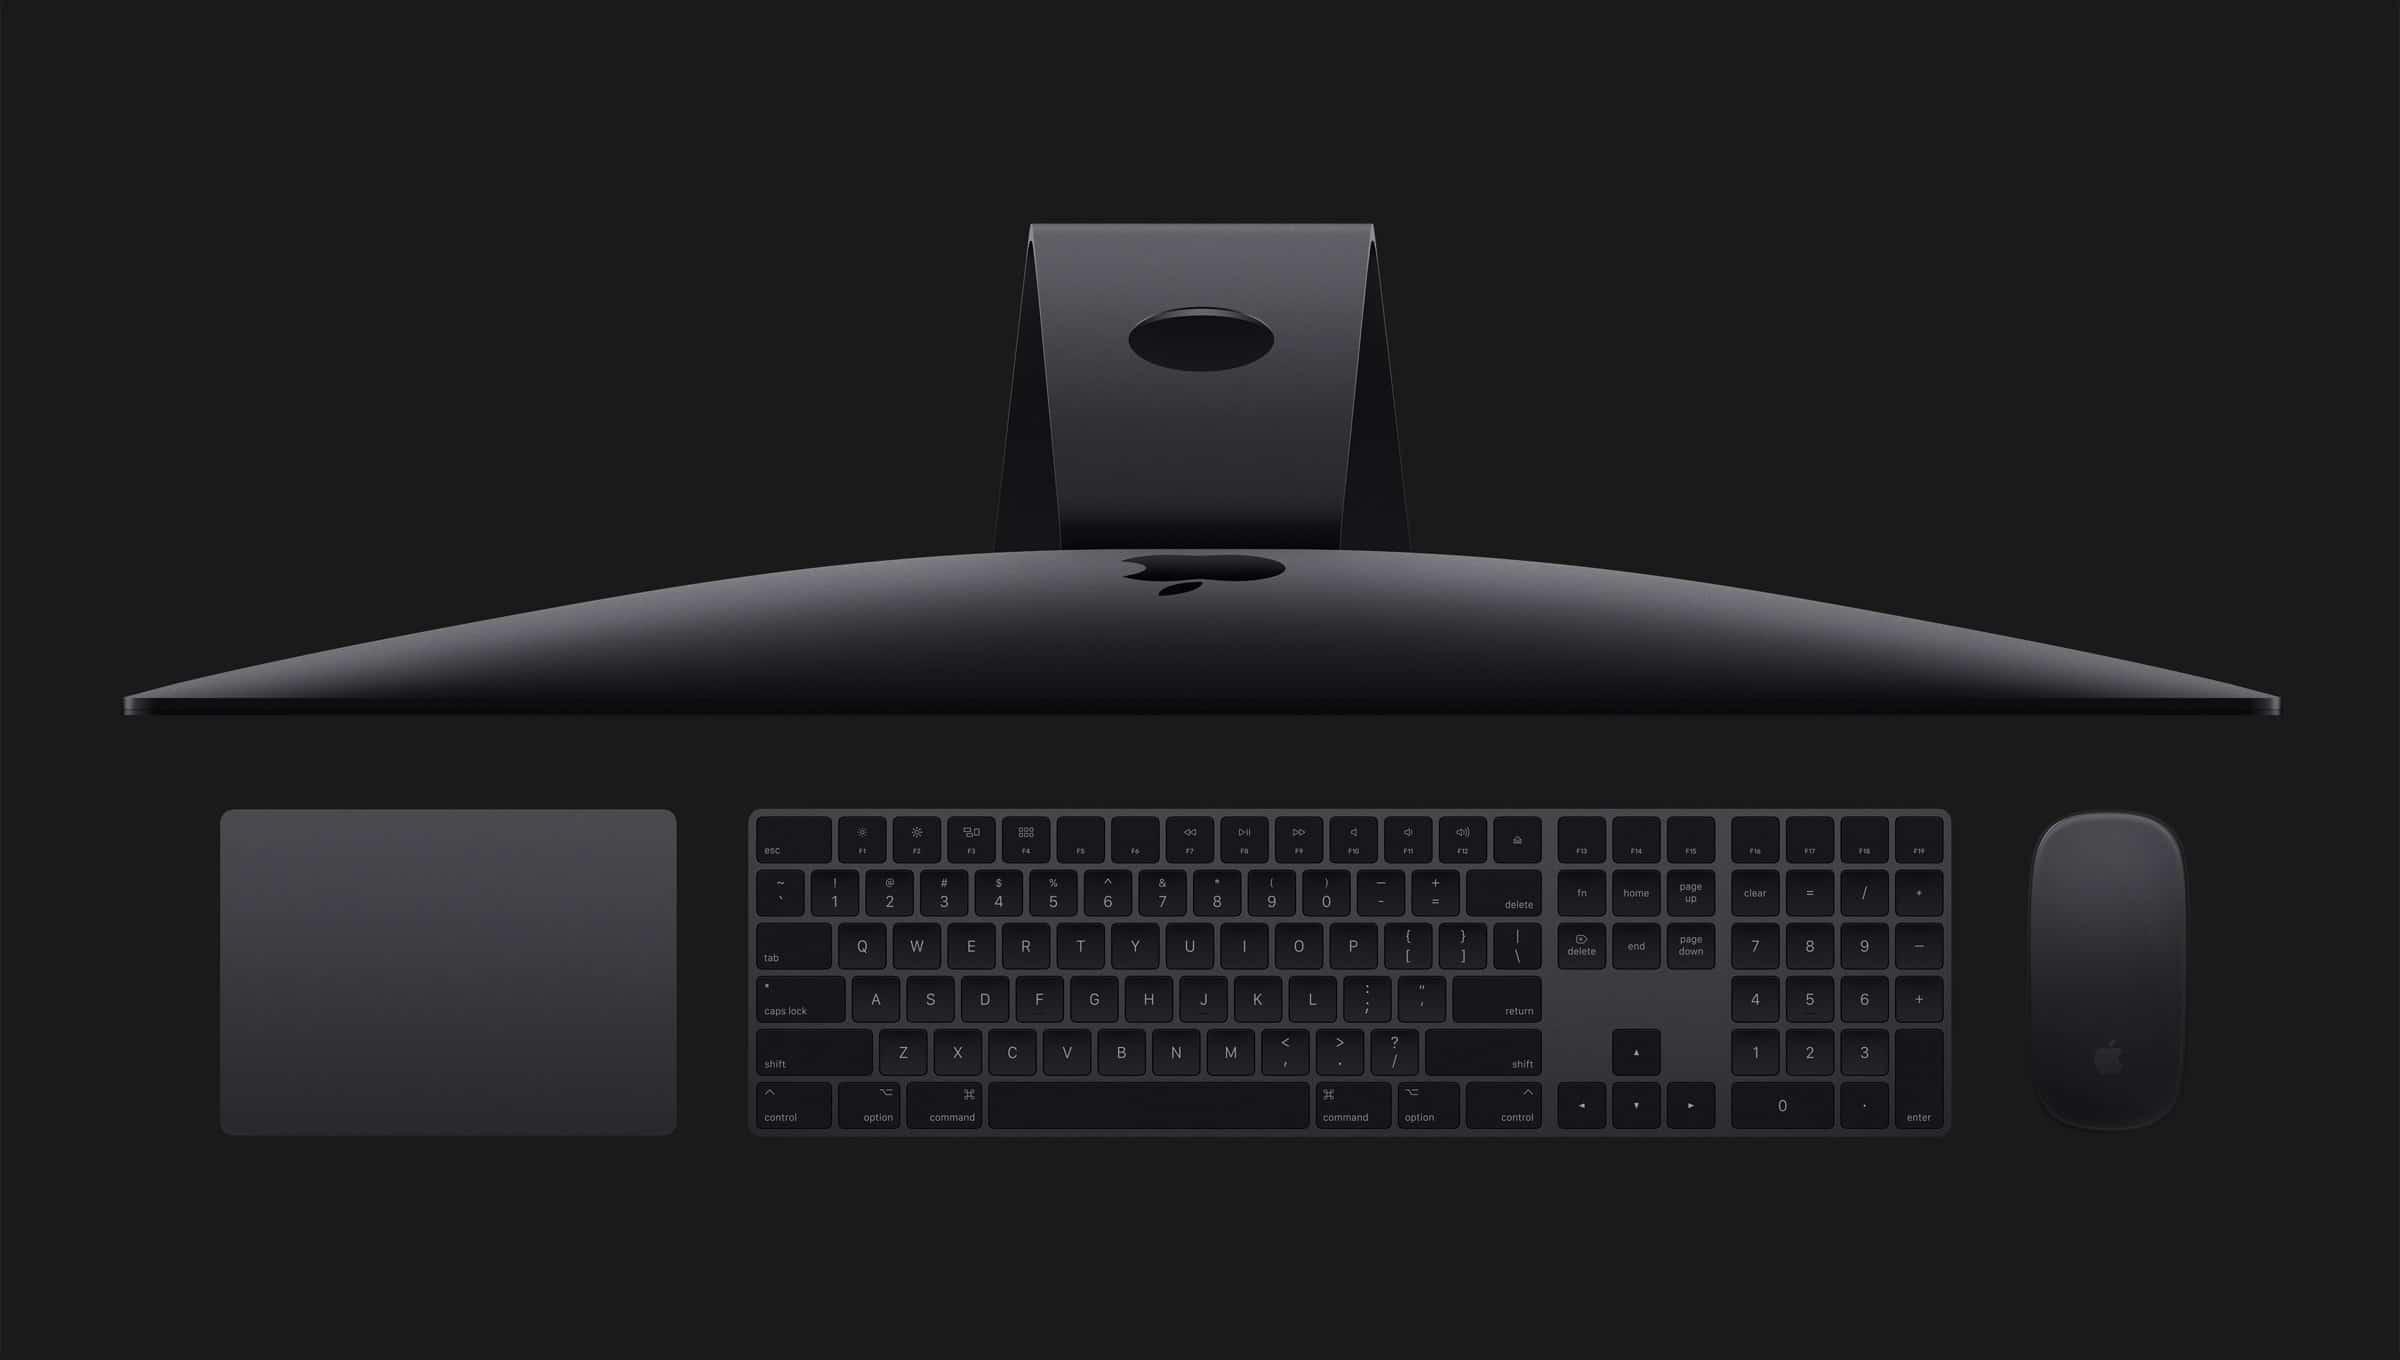 photo gear pare down - iMac pro photo - courtesy of Apple